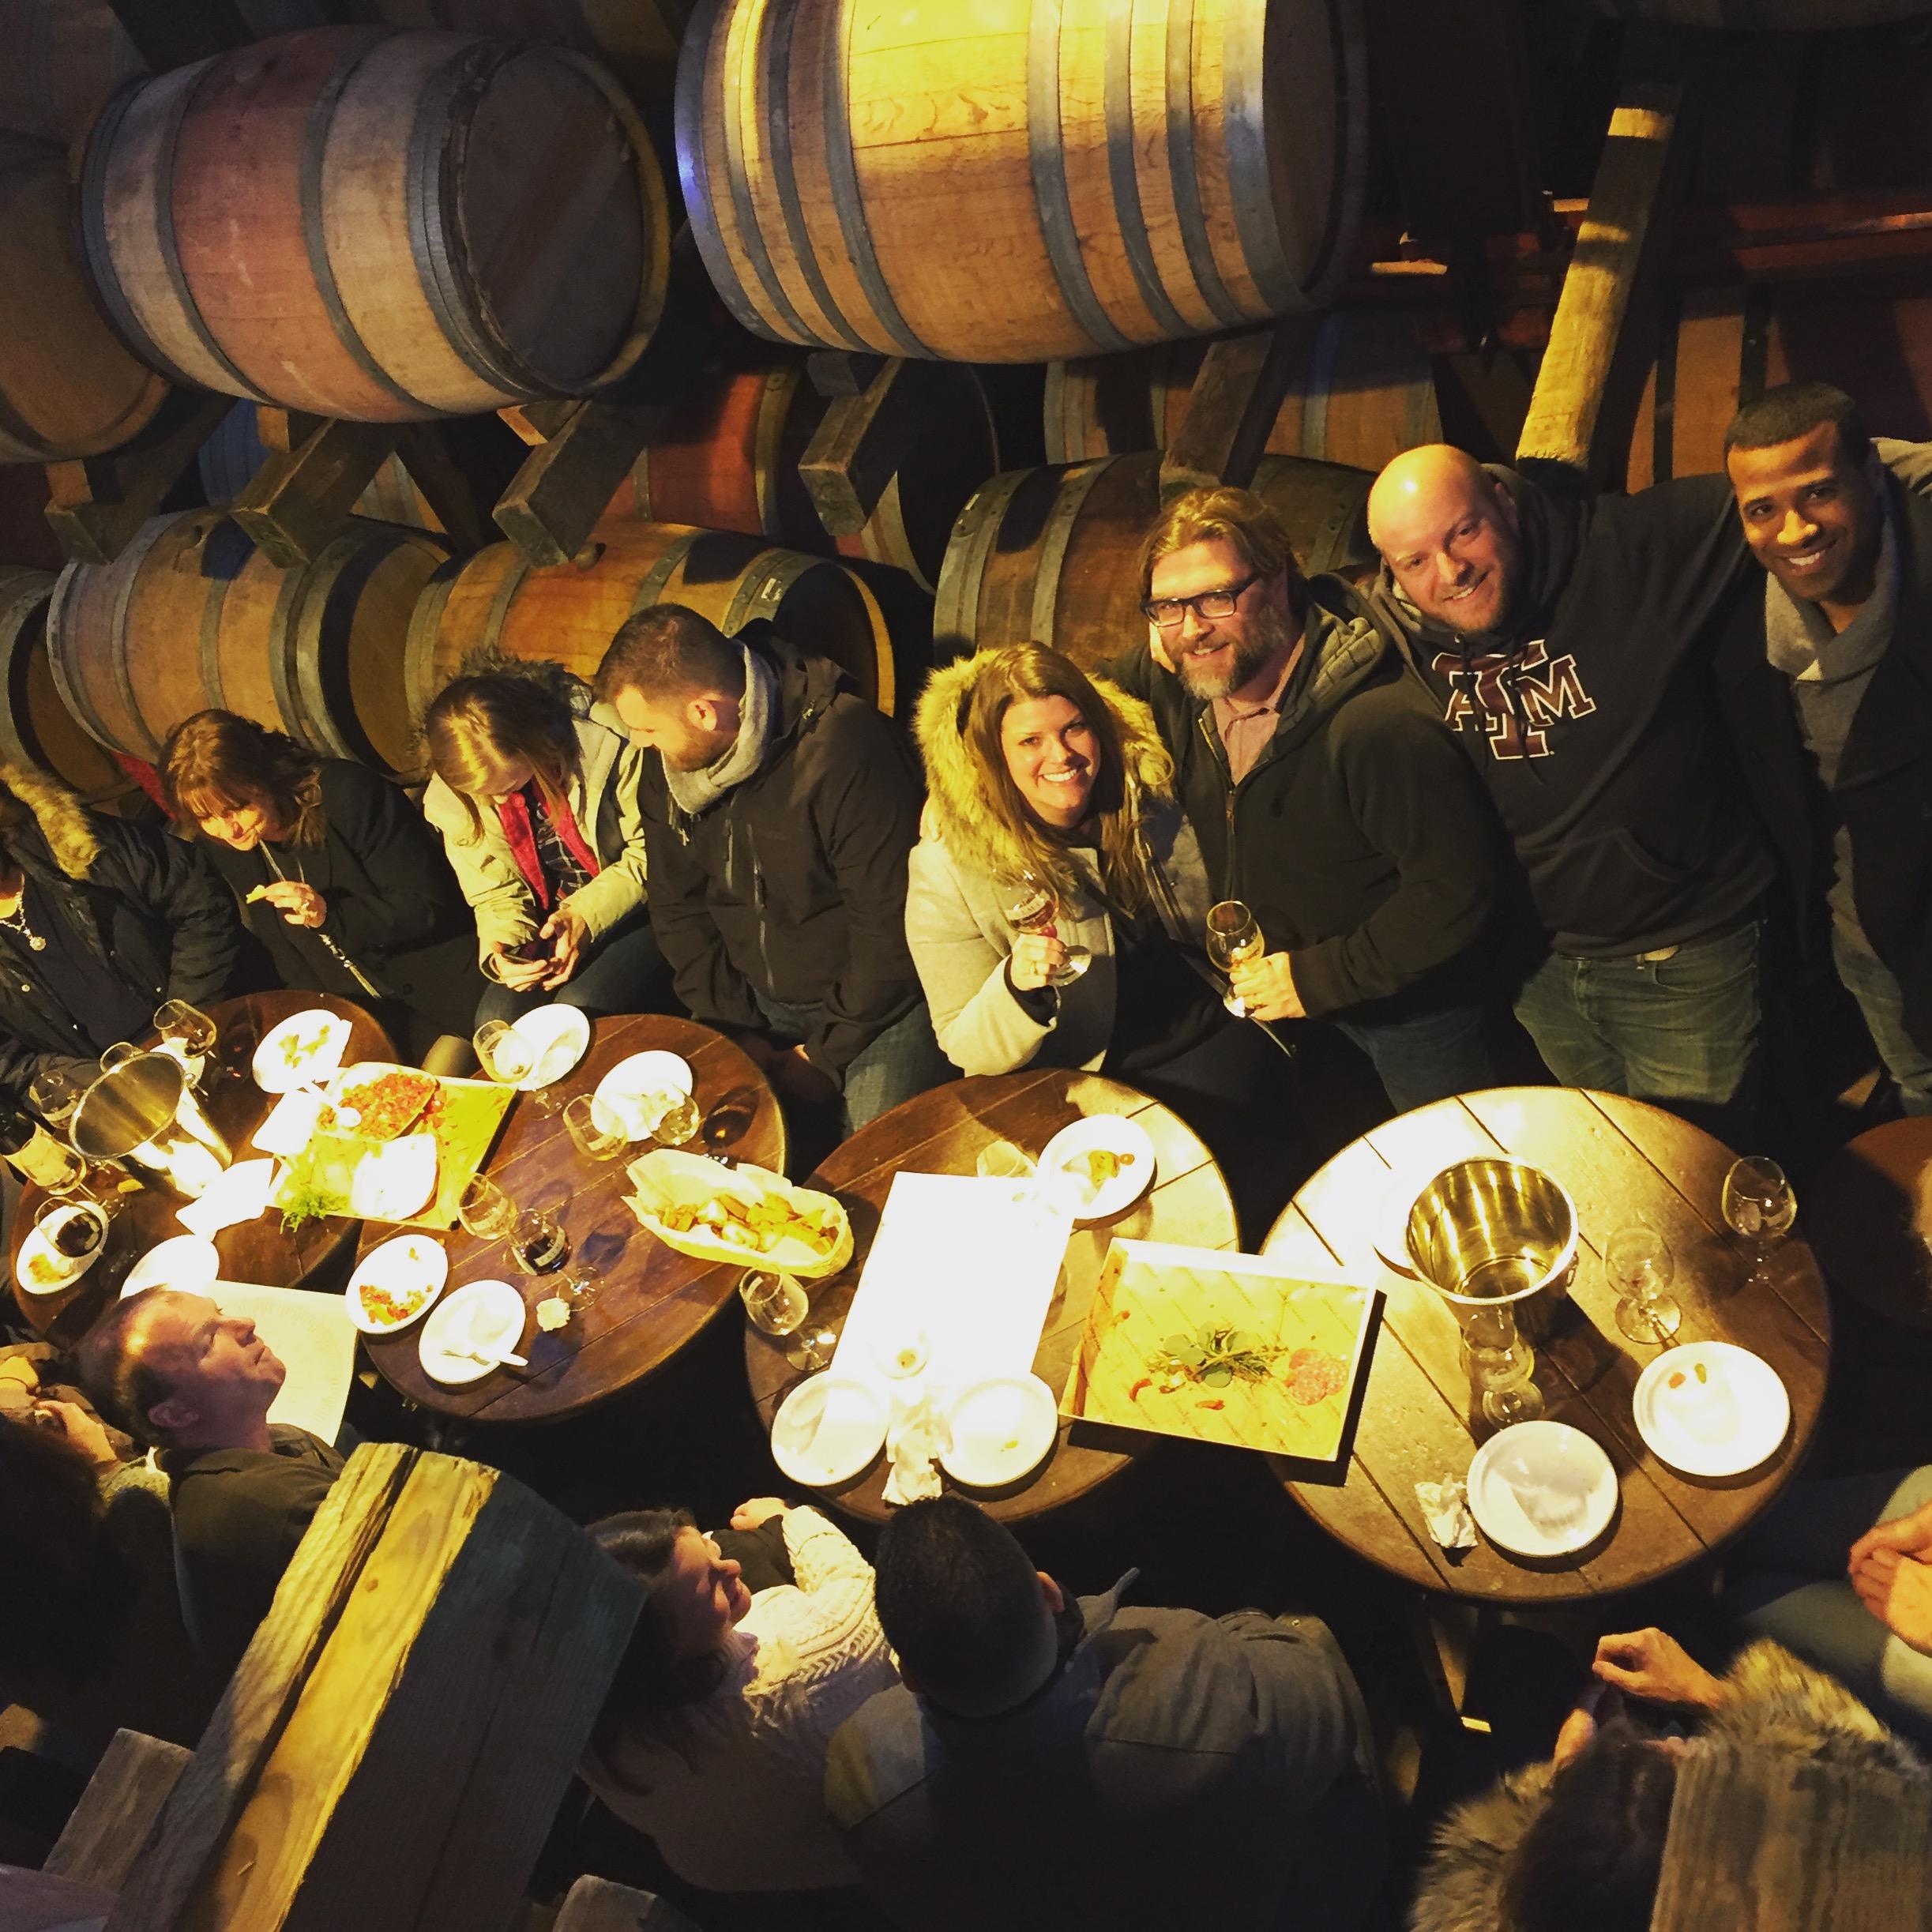 Barrel room tasting group